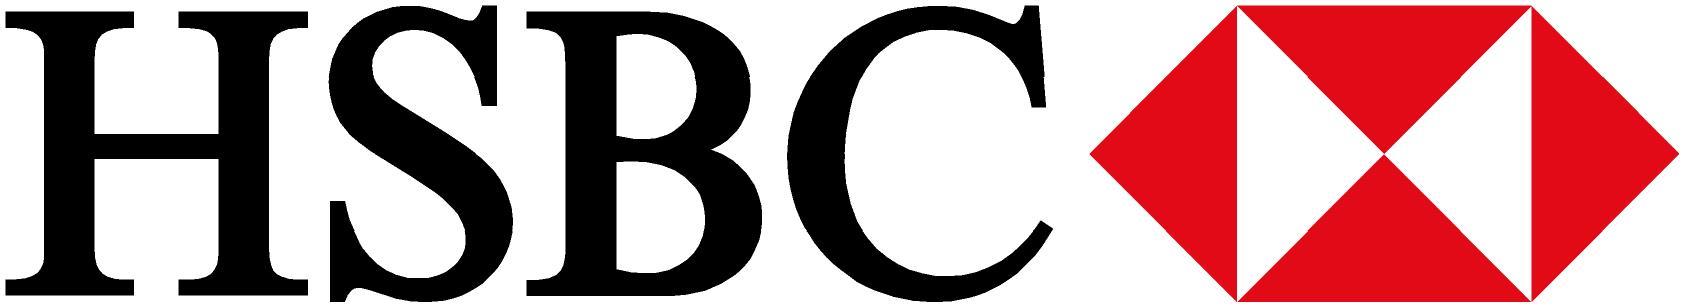 Logo Hsbc Alumneye Preparation Entretien M Amp A Trading